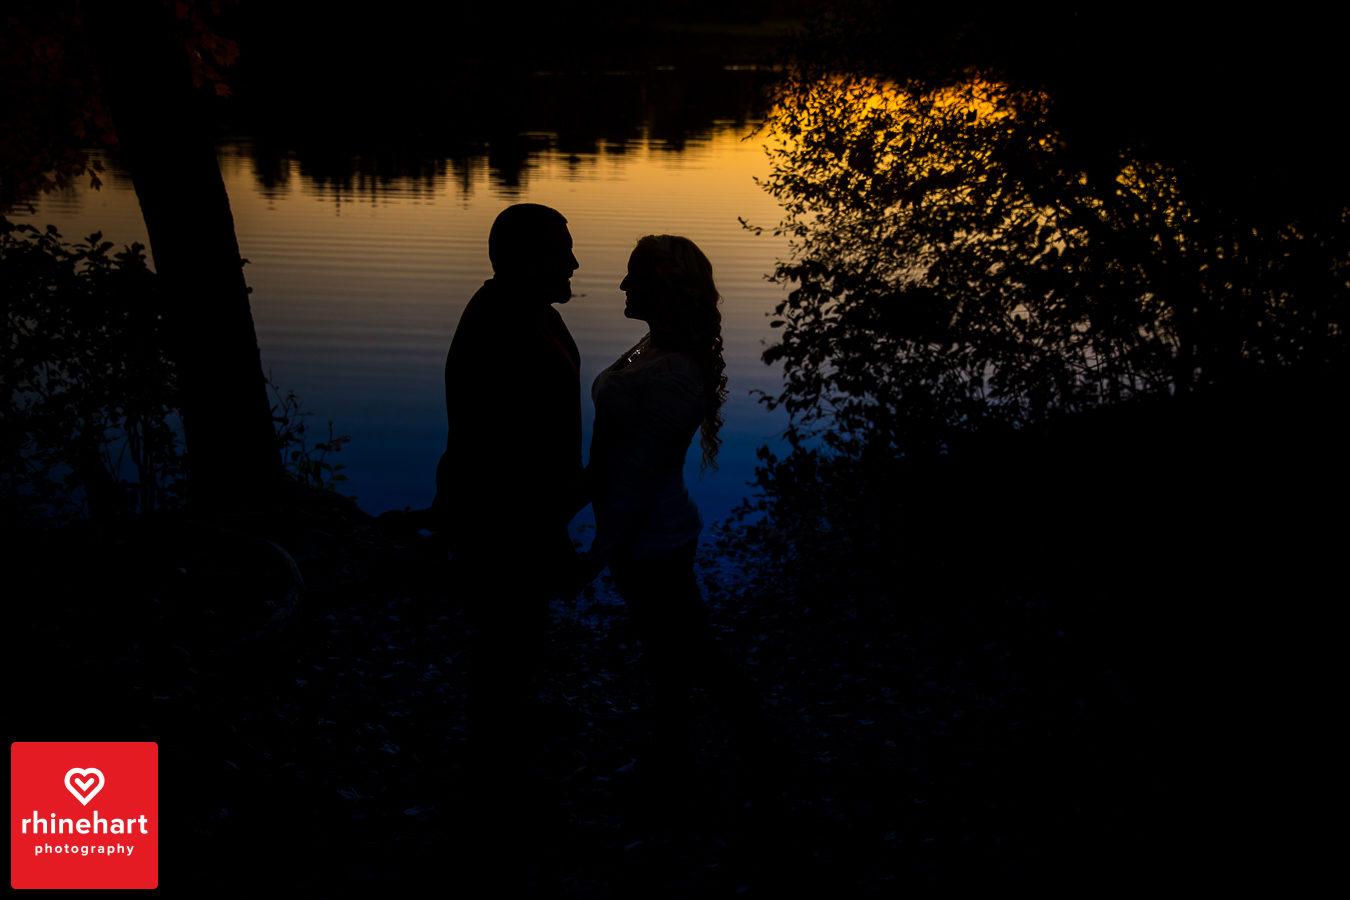 lebanon-valley-college-wedding-engagement-photographers-creative-unique-top-best-18